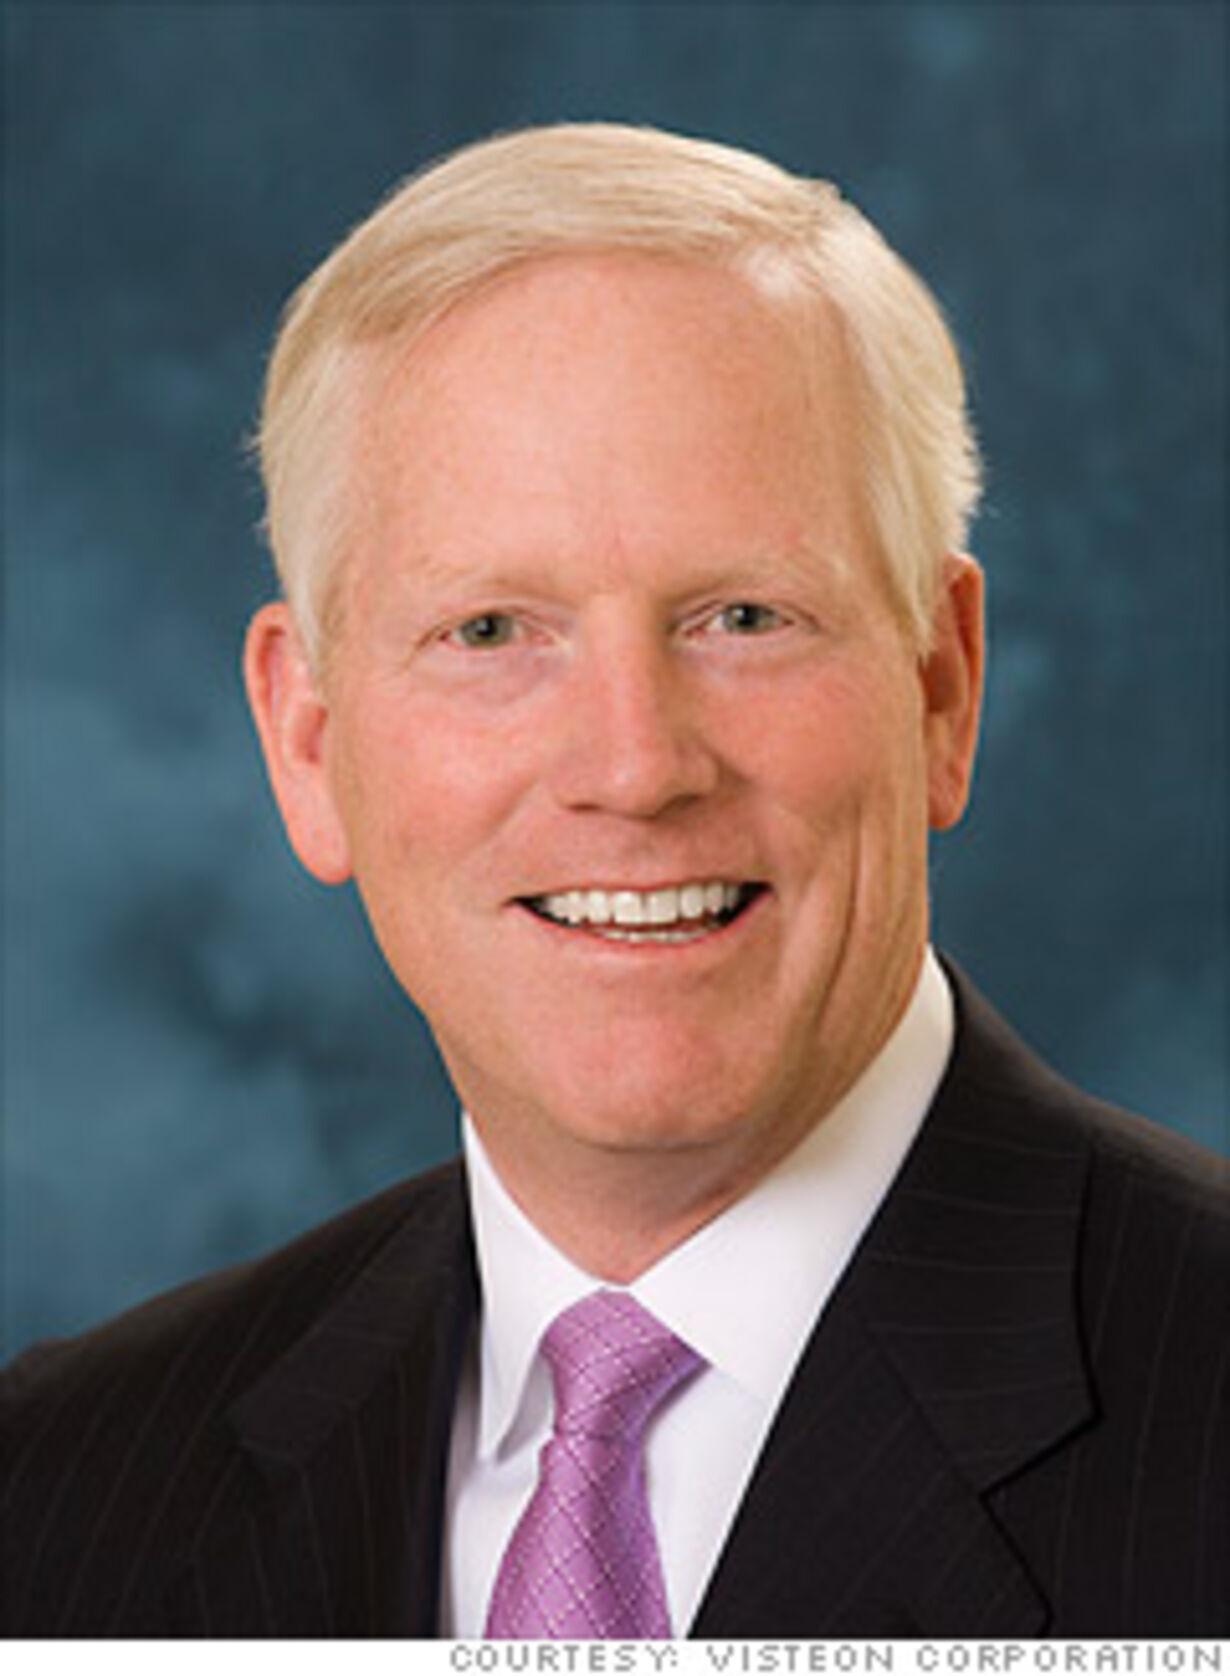 3. Donald J. Stebbins